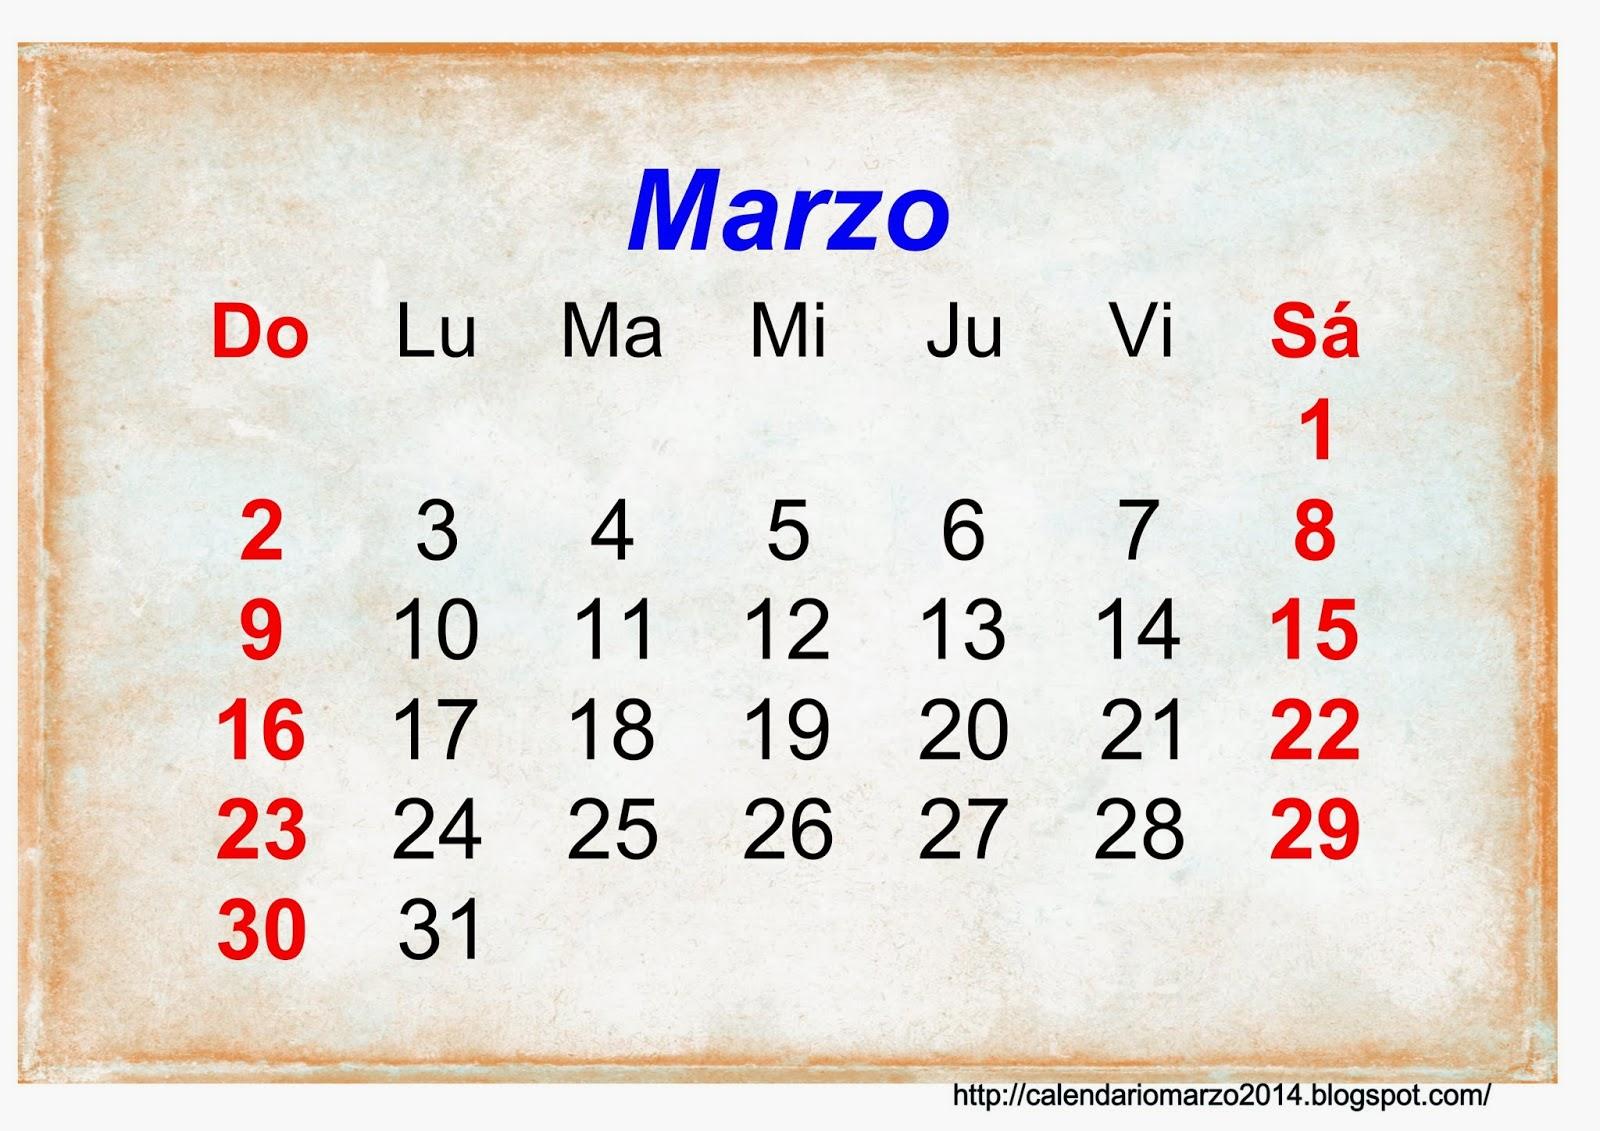 Calendario Marzo 2014 para imprimir gratis